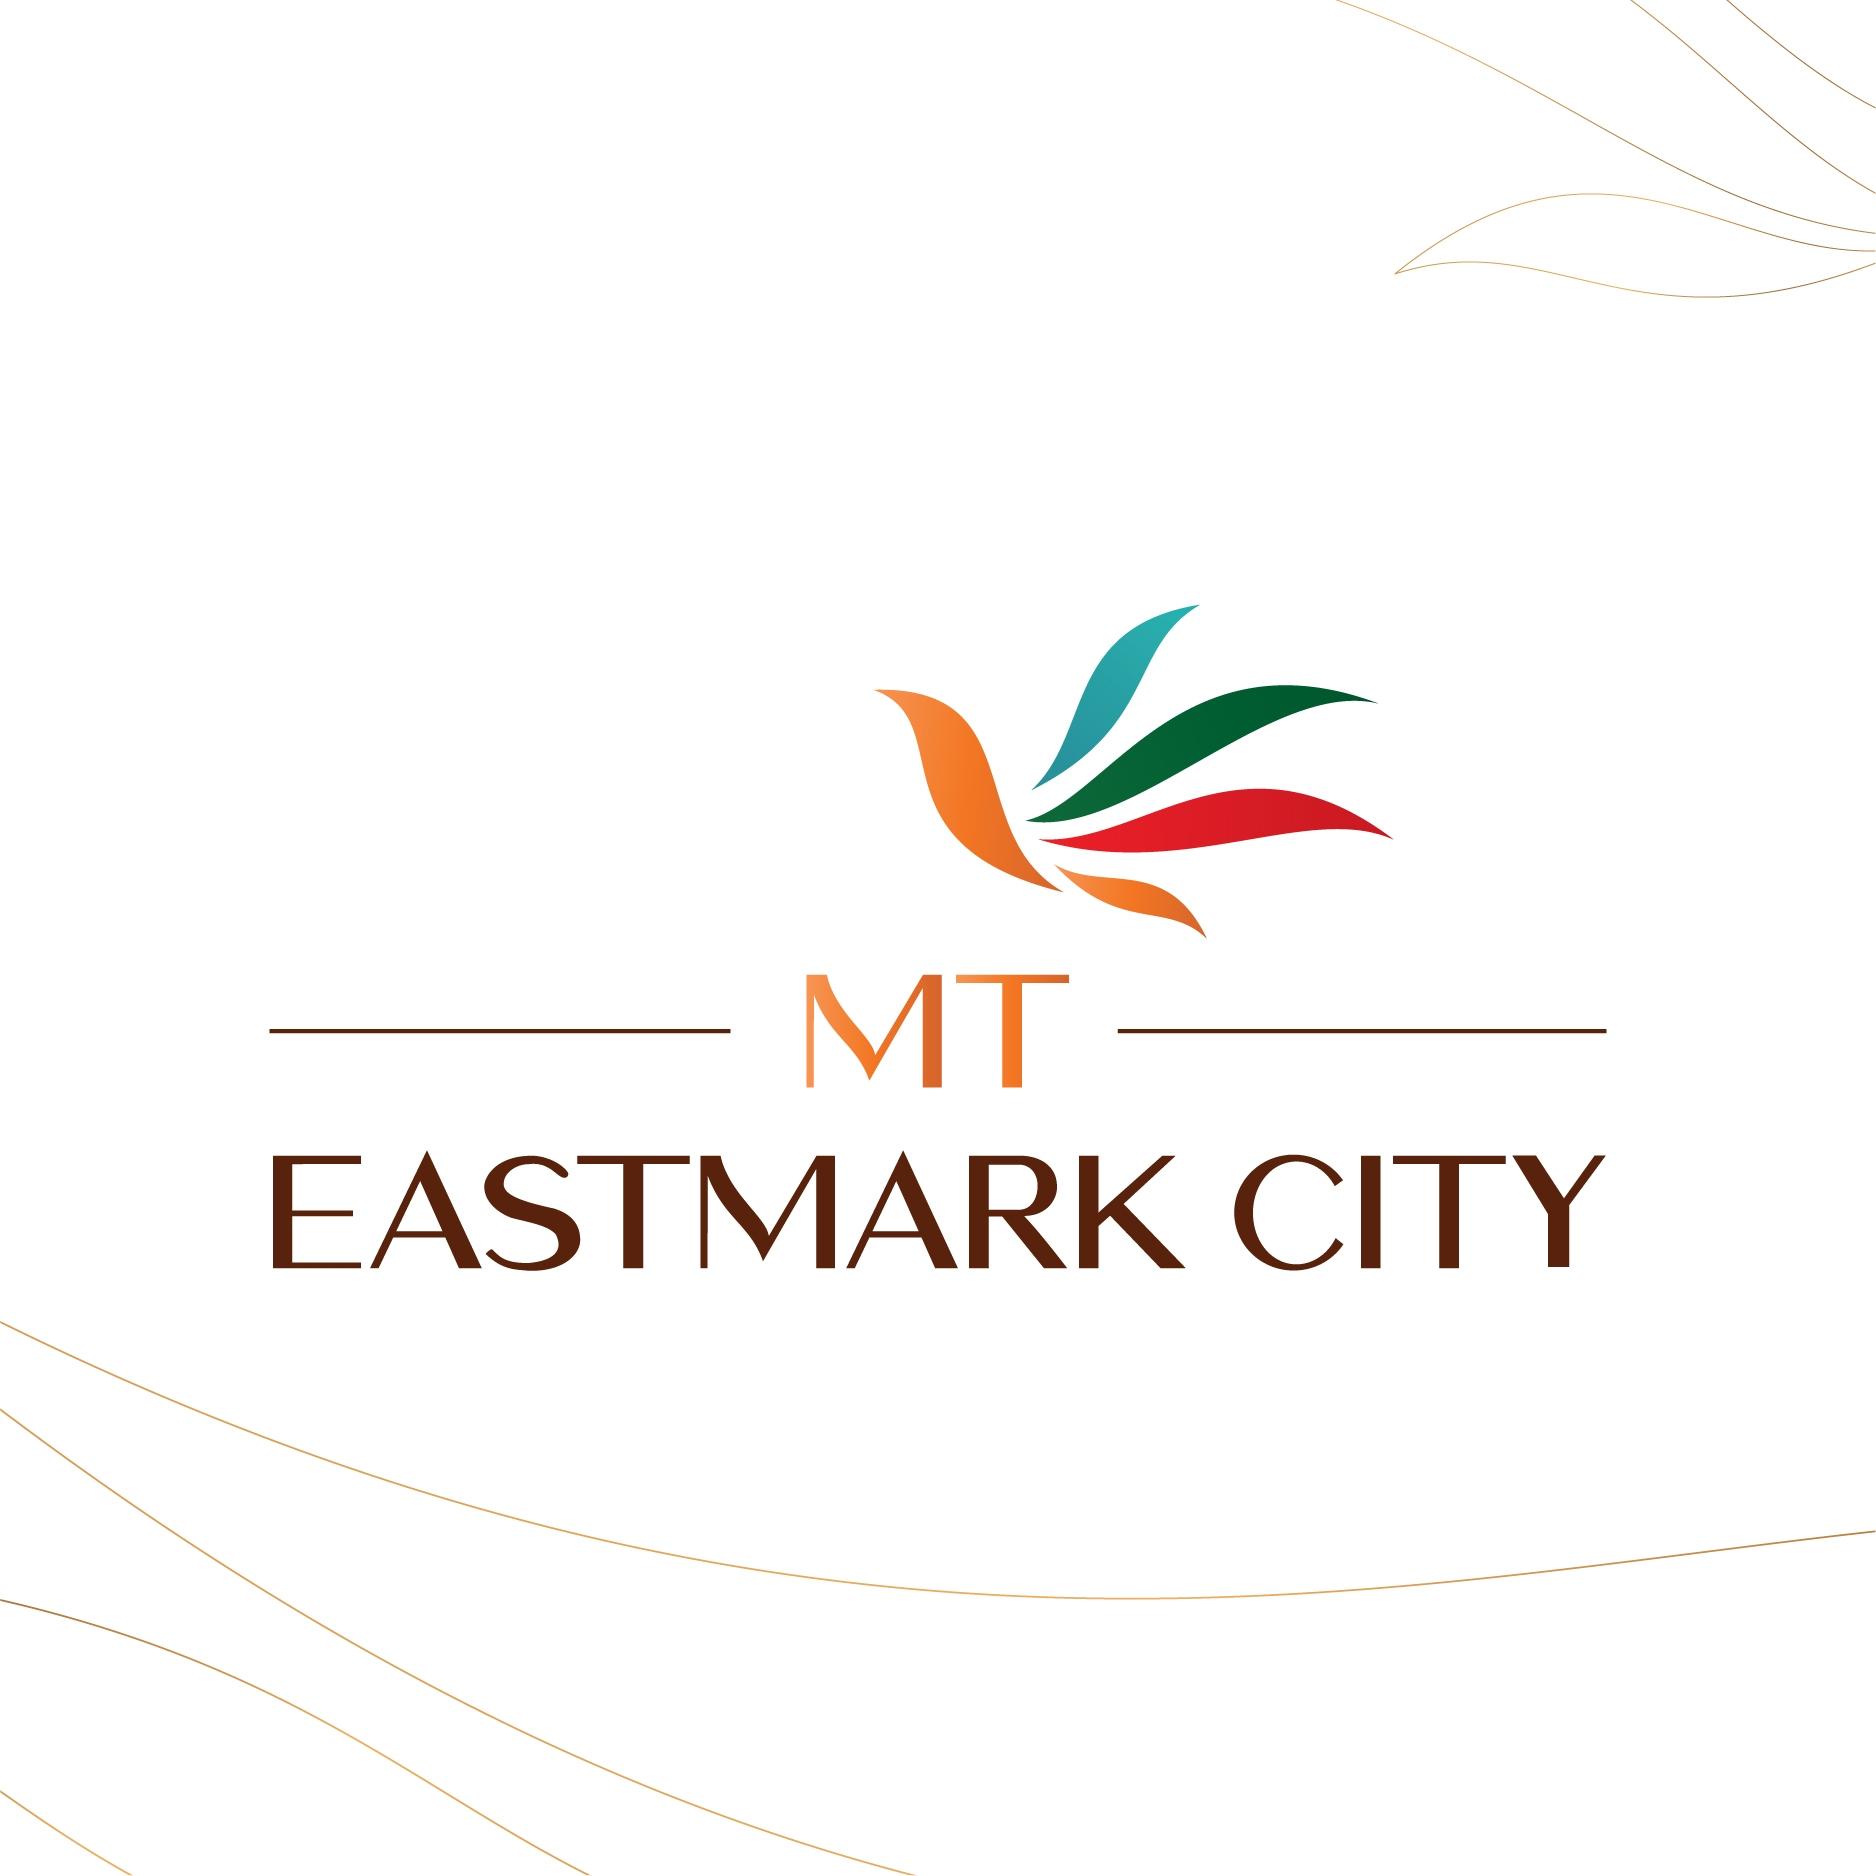 logo-du-an-mt-eastmark-city